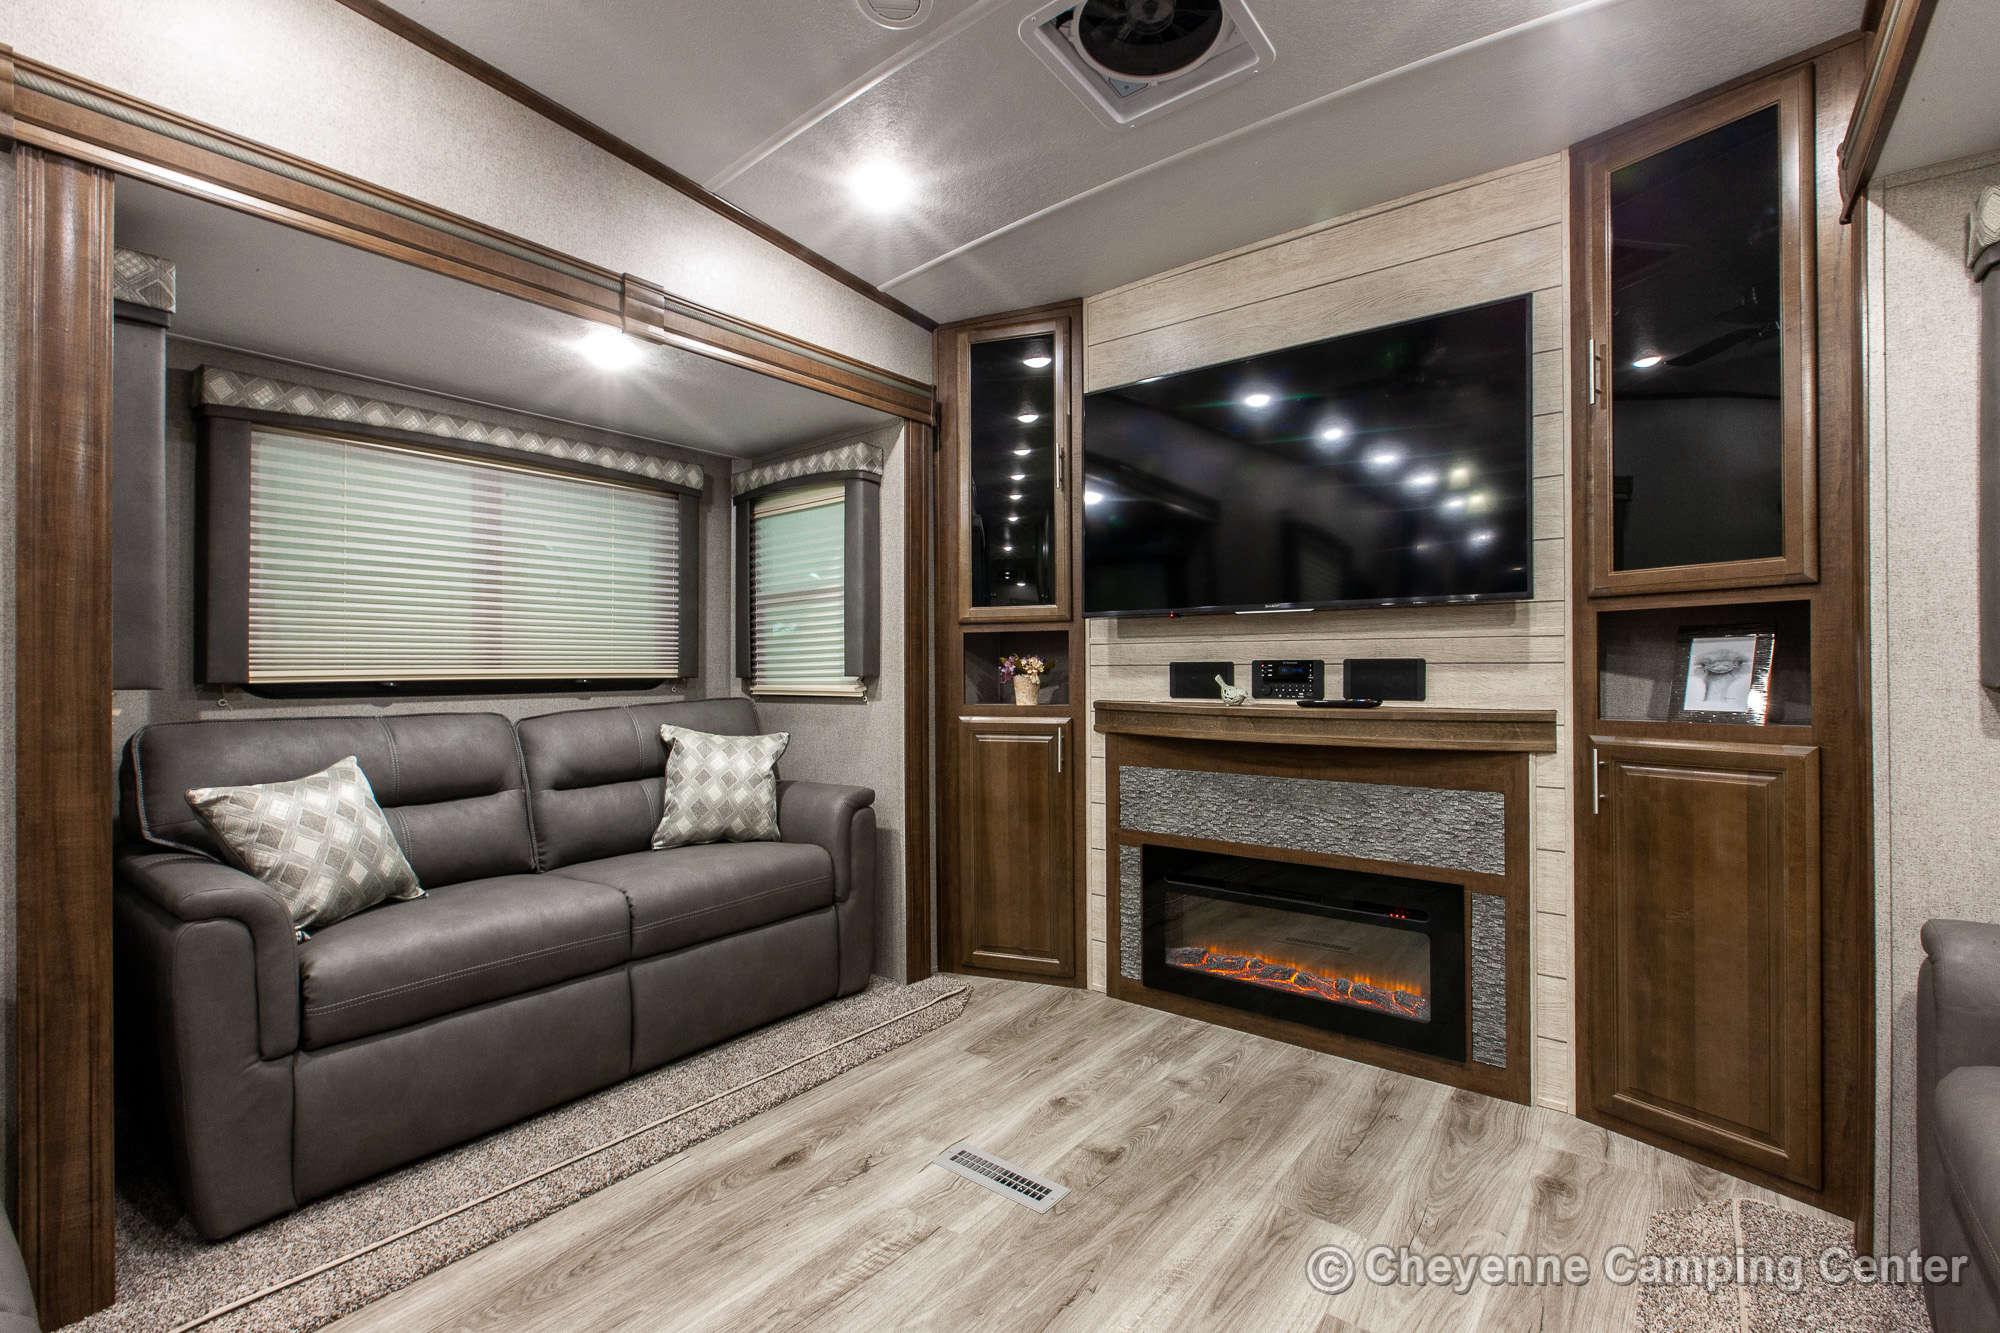 2021 Forest River Flagstaff Super Lite 529RLKS Fifth Wheel Interior Image